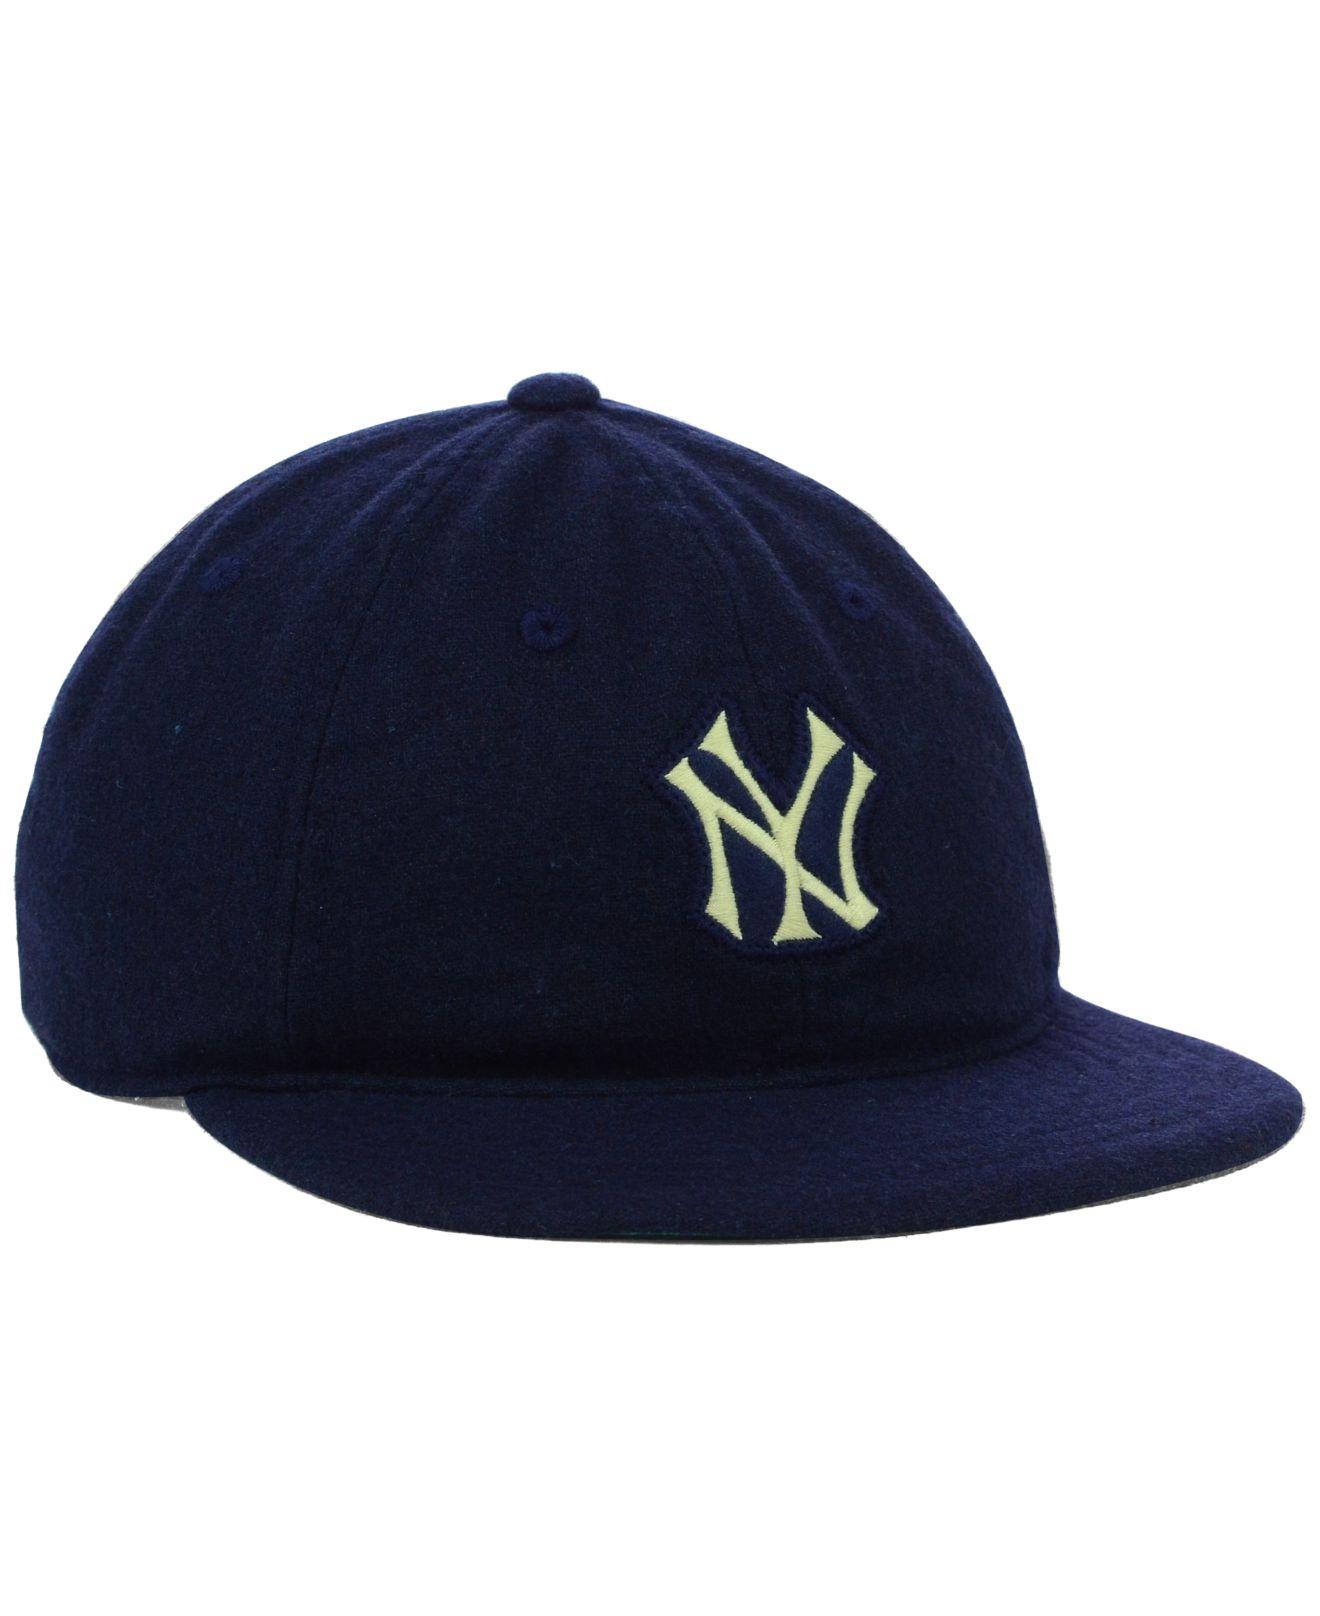 Lyst - American Needle American New York Yankees Mlb Statesman Cap ... d205956d392